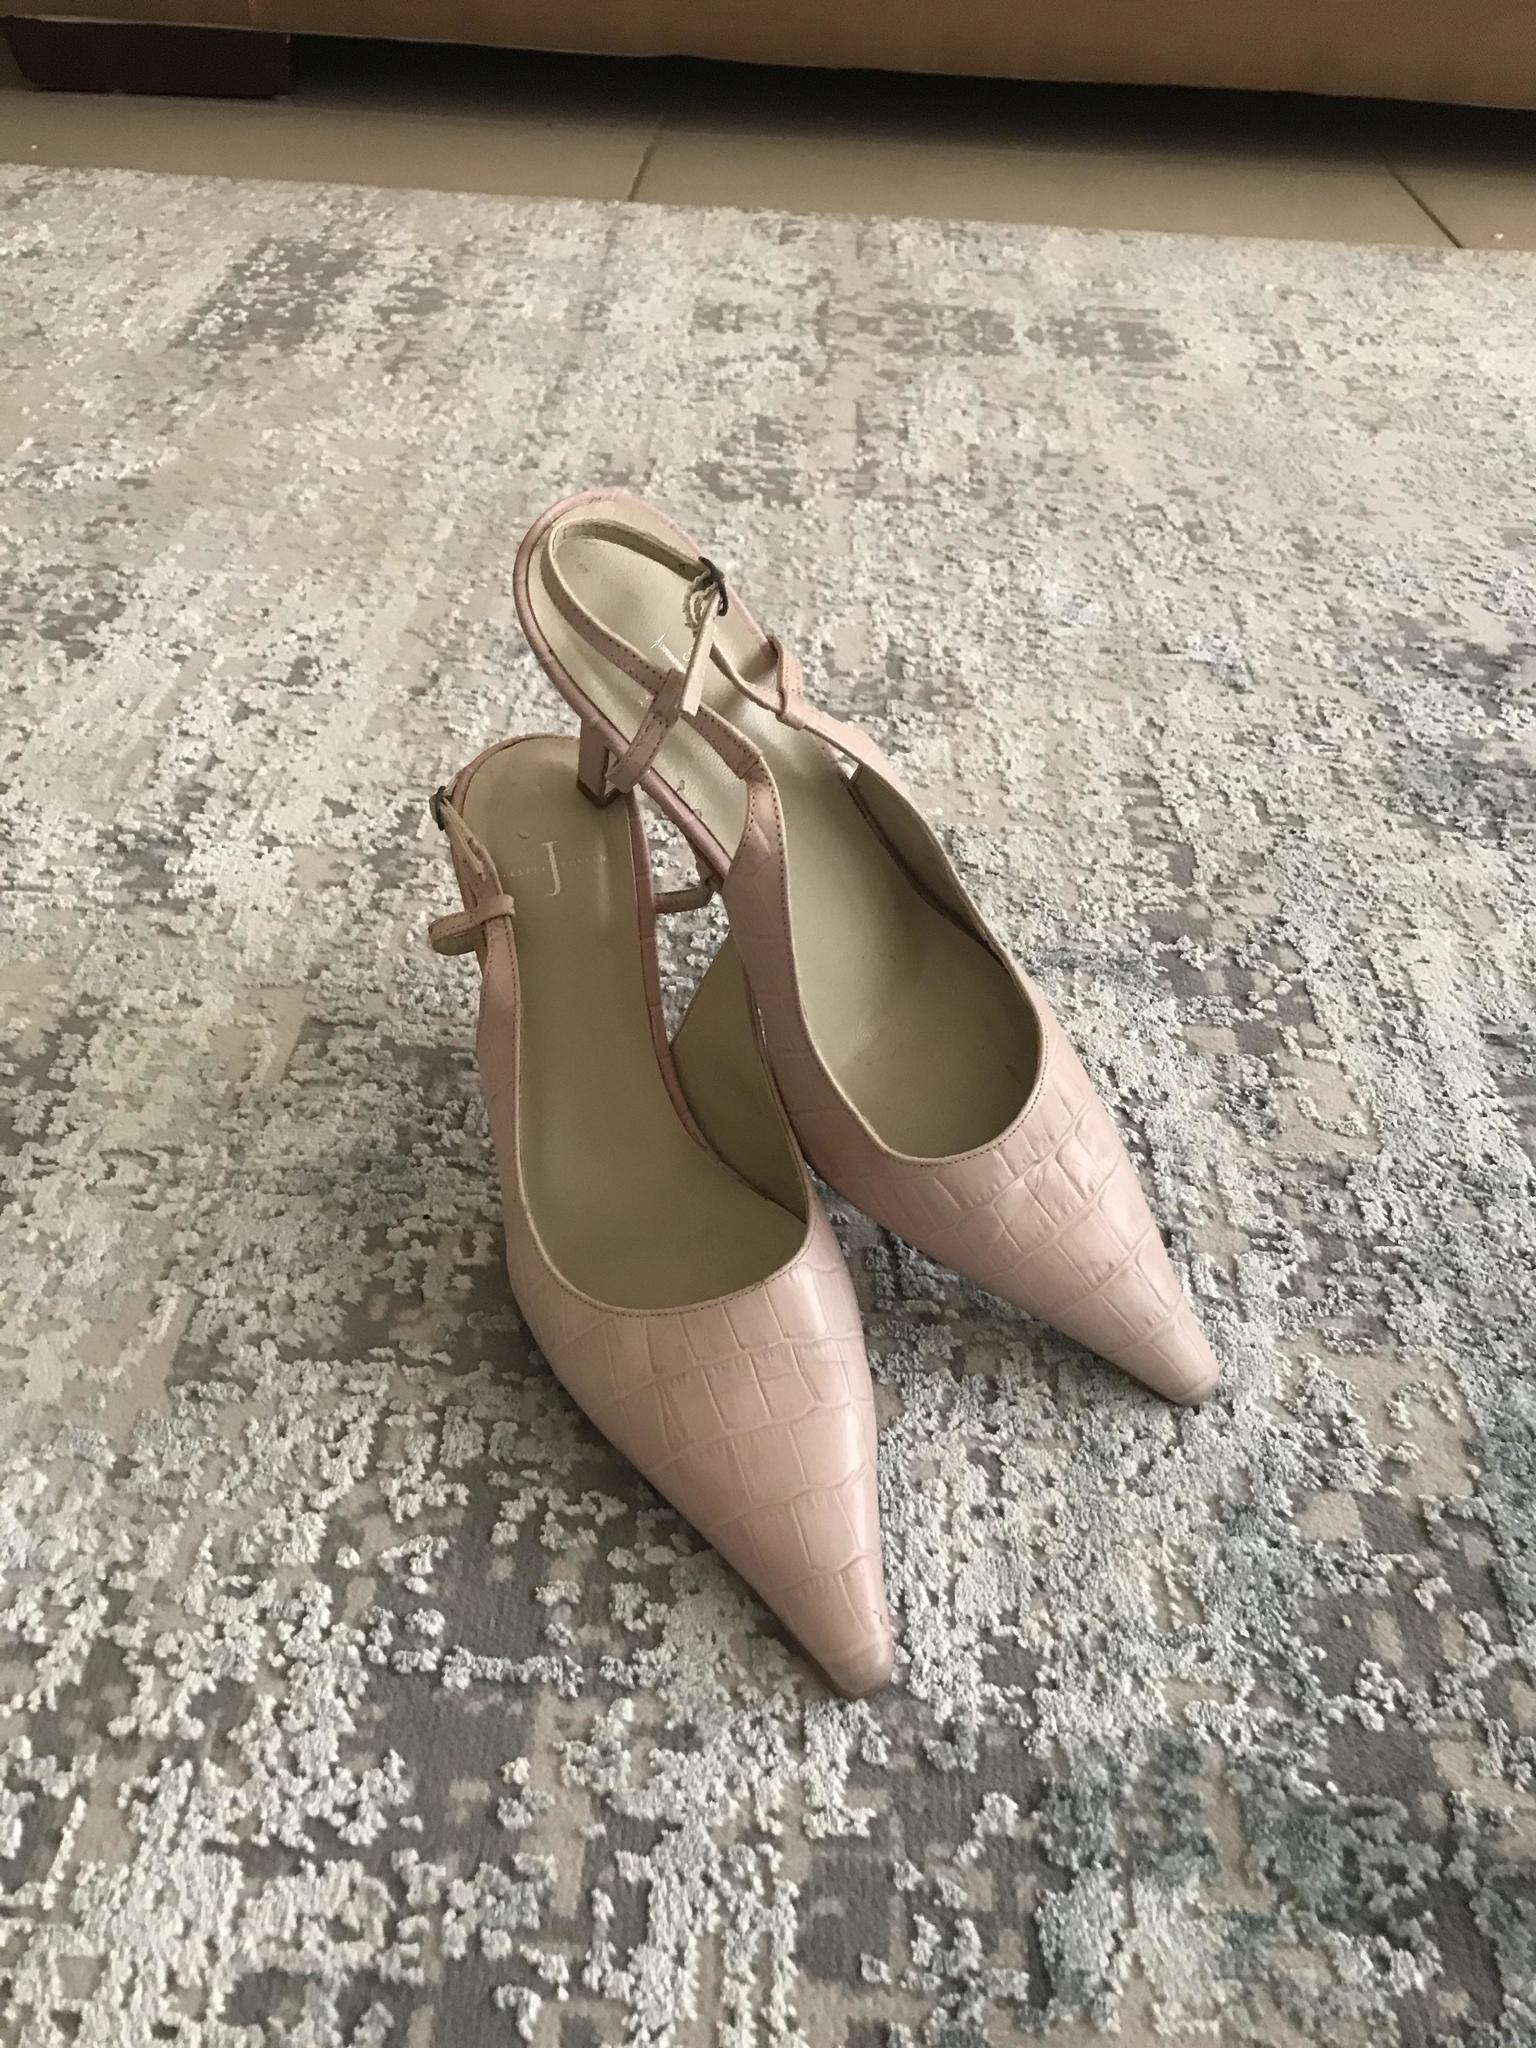 Jasper Conran brand shoes